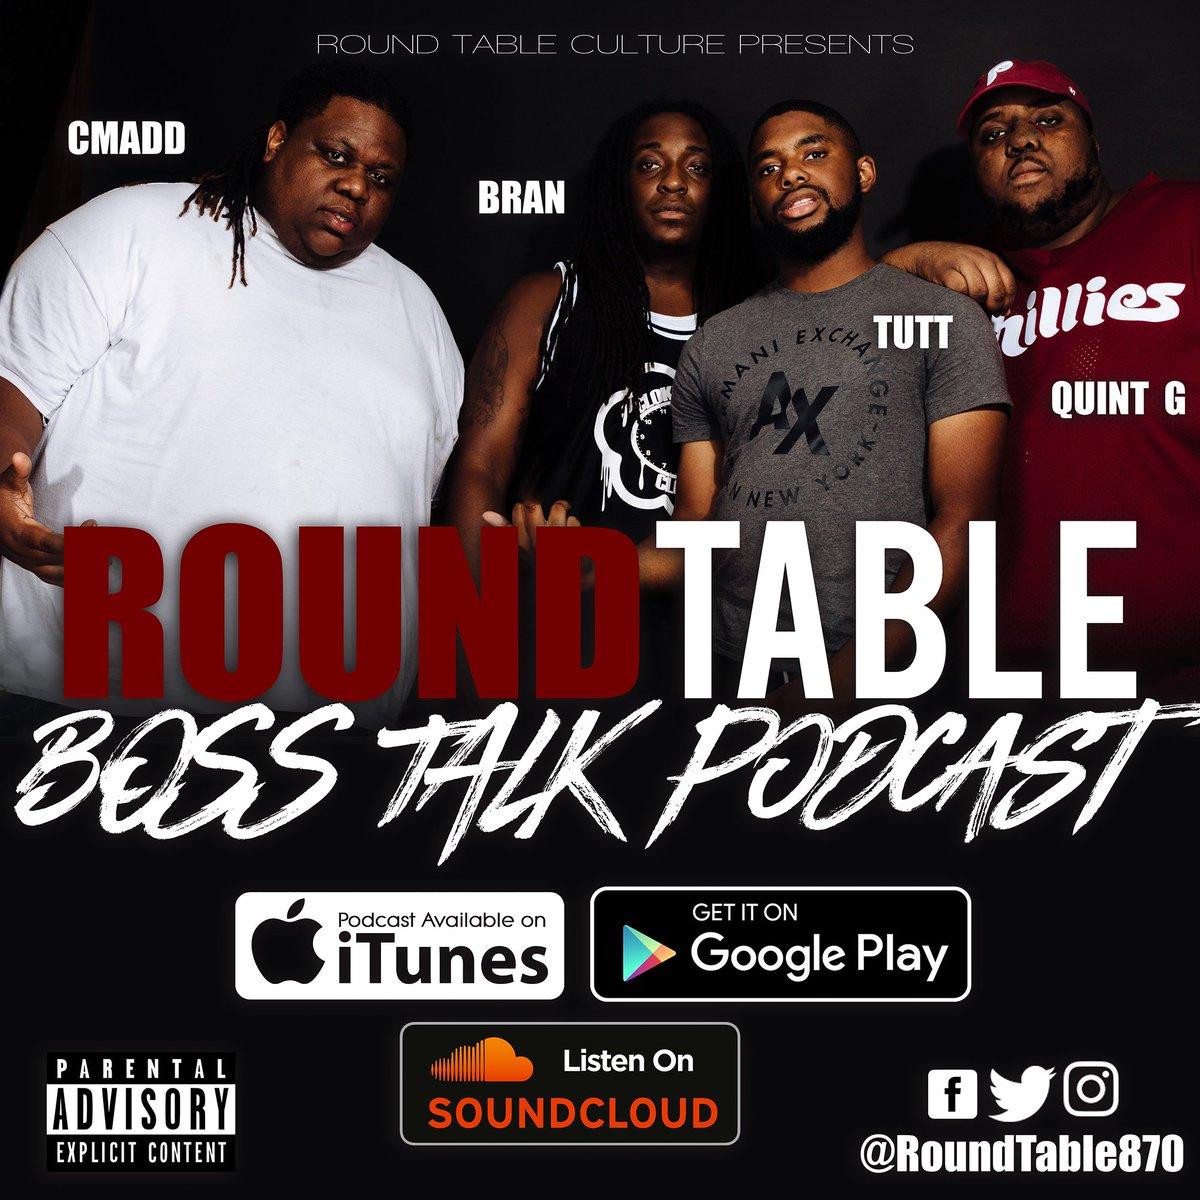 Round Table Podcast.Round Table Podcast Roundtable870 Twitter